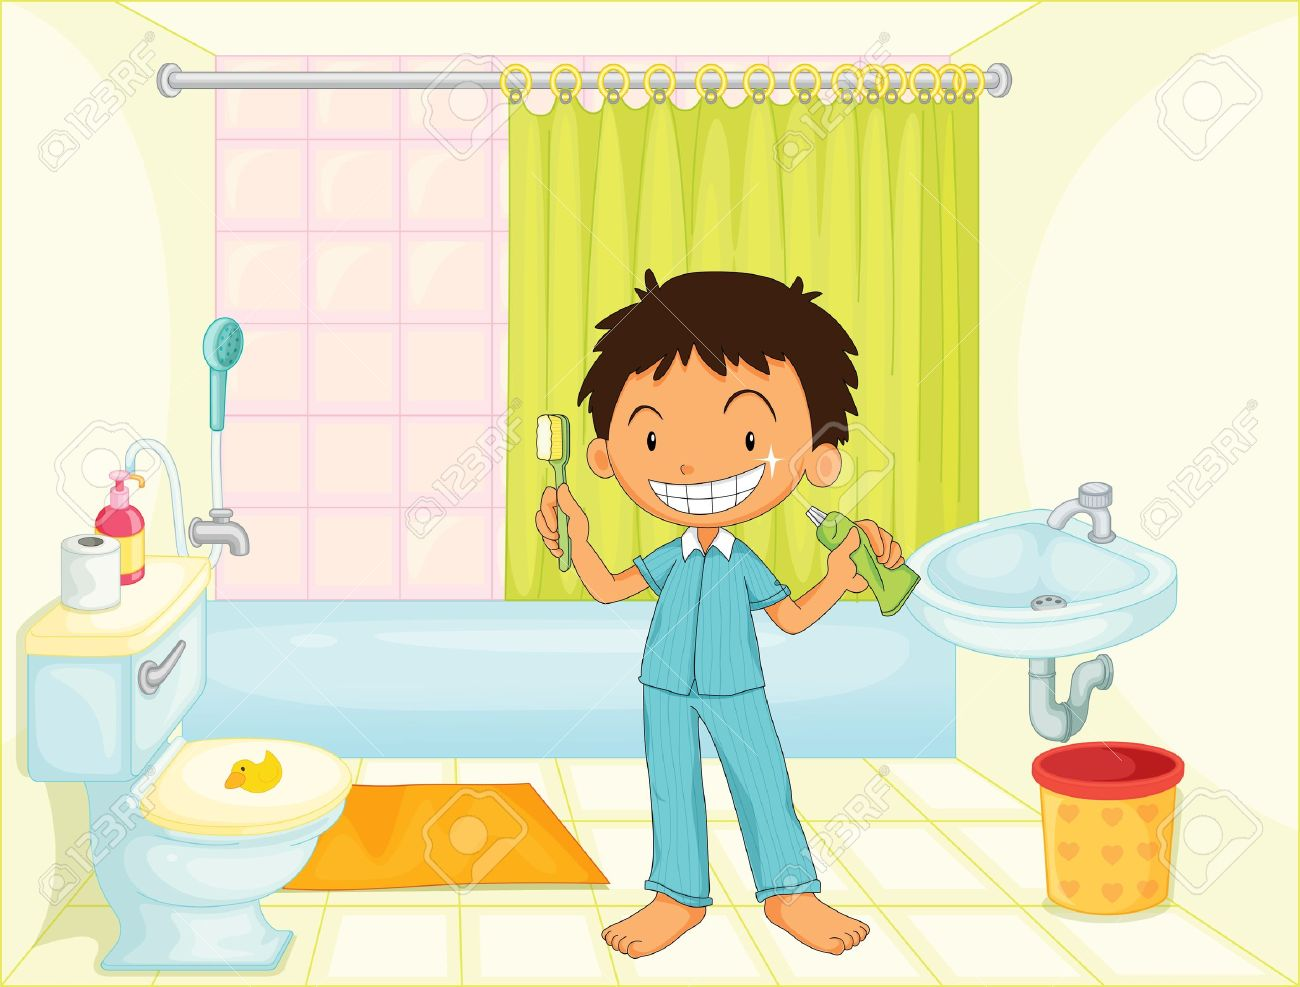 concevoir ma salle de bains en 3d leroy merlin. fantaisie dessiner ... - Dessiner Ma Salle De Bain